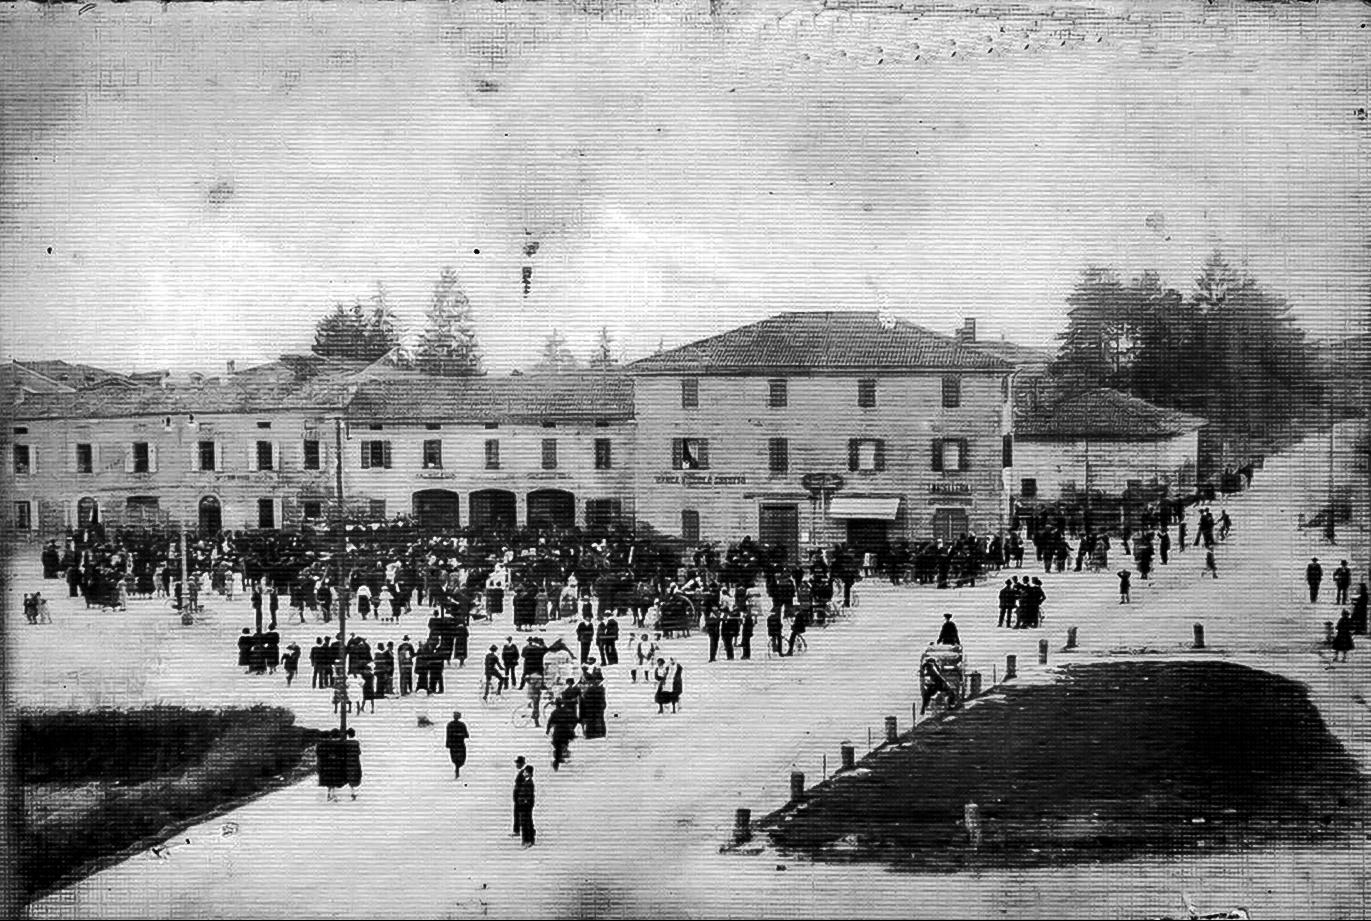 1917 Piazza Marconi